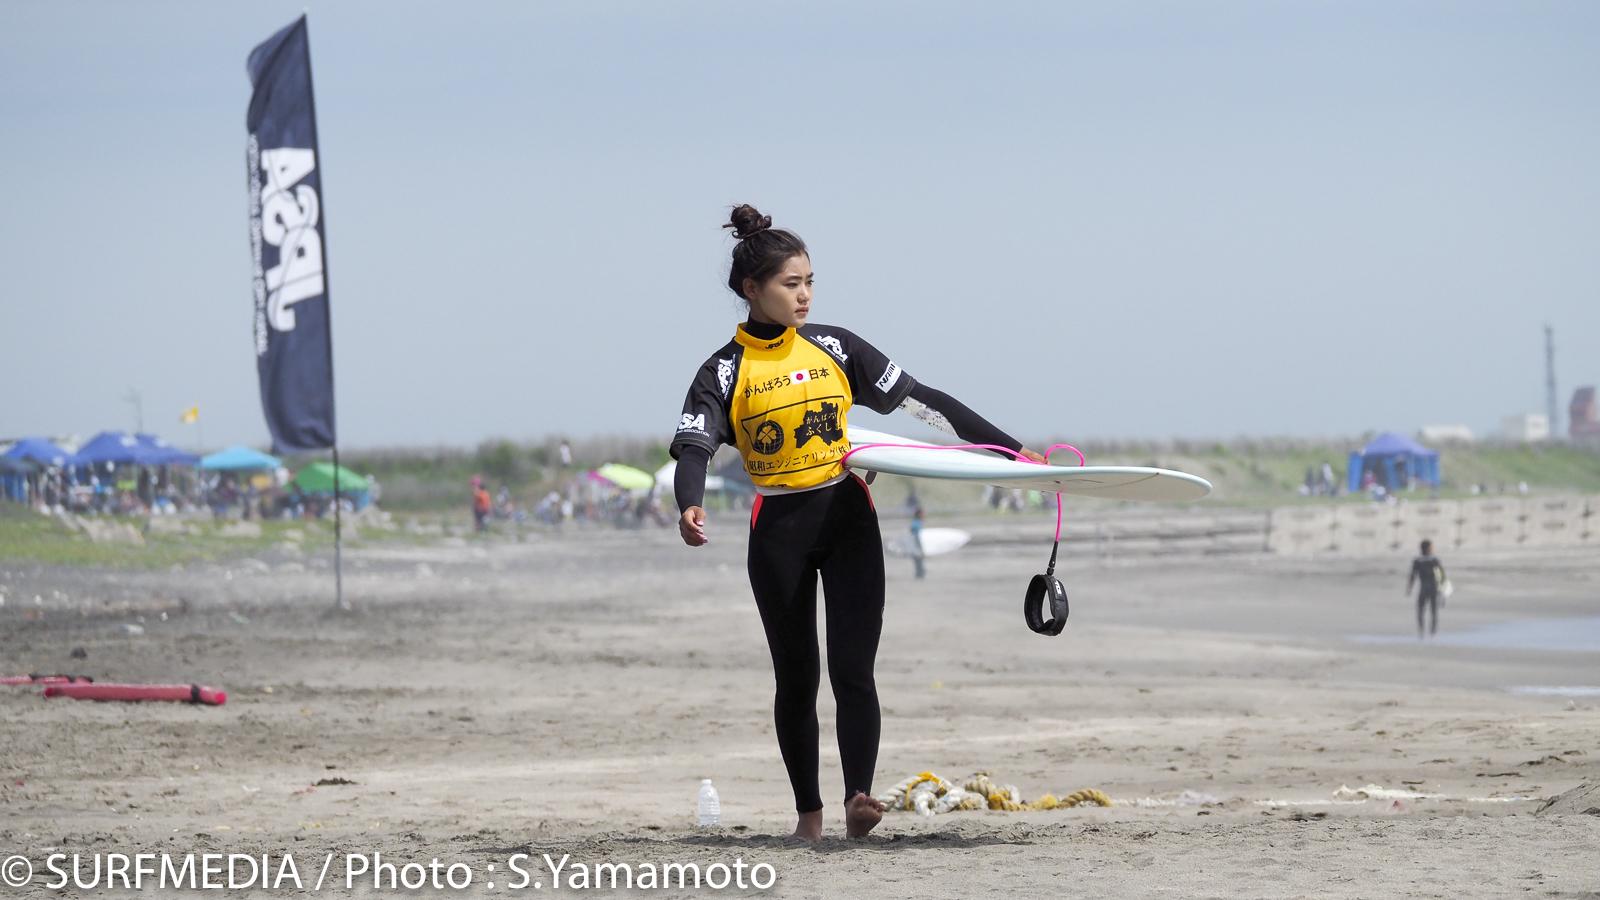 minami koyama-6041812